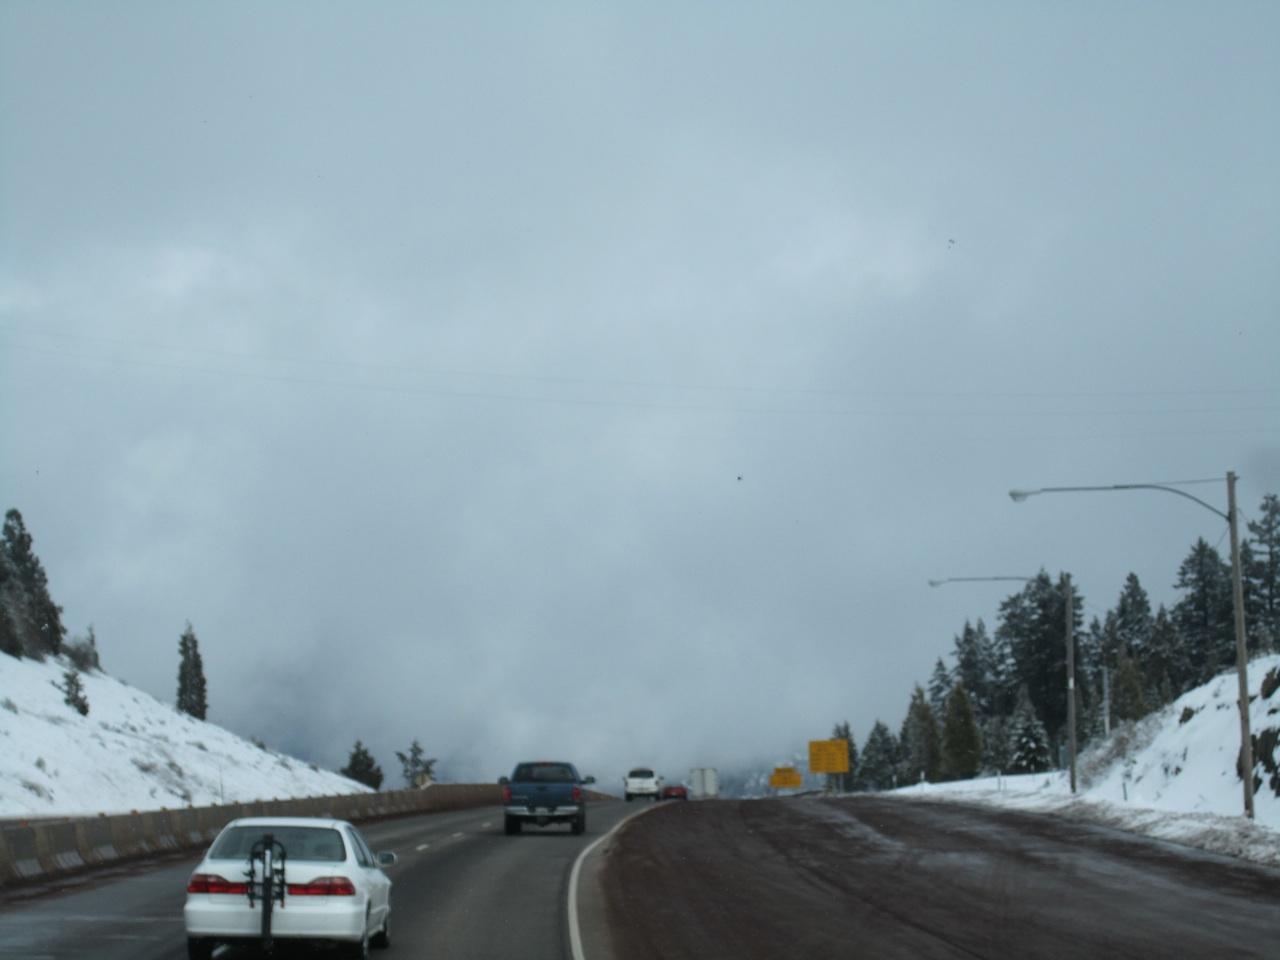 Heading Into A Snow Topped Mountain